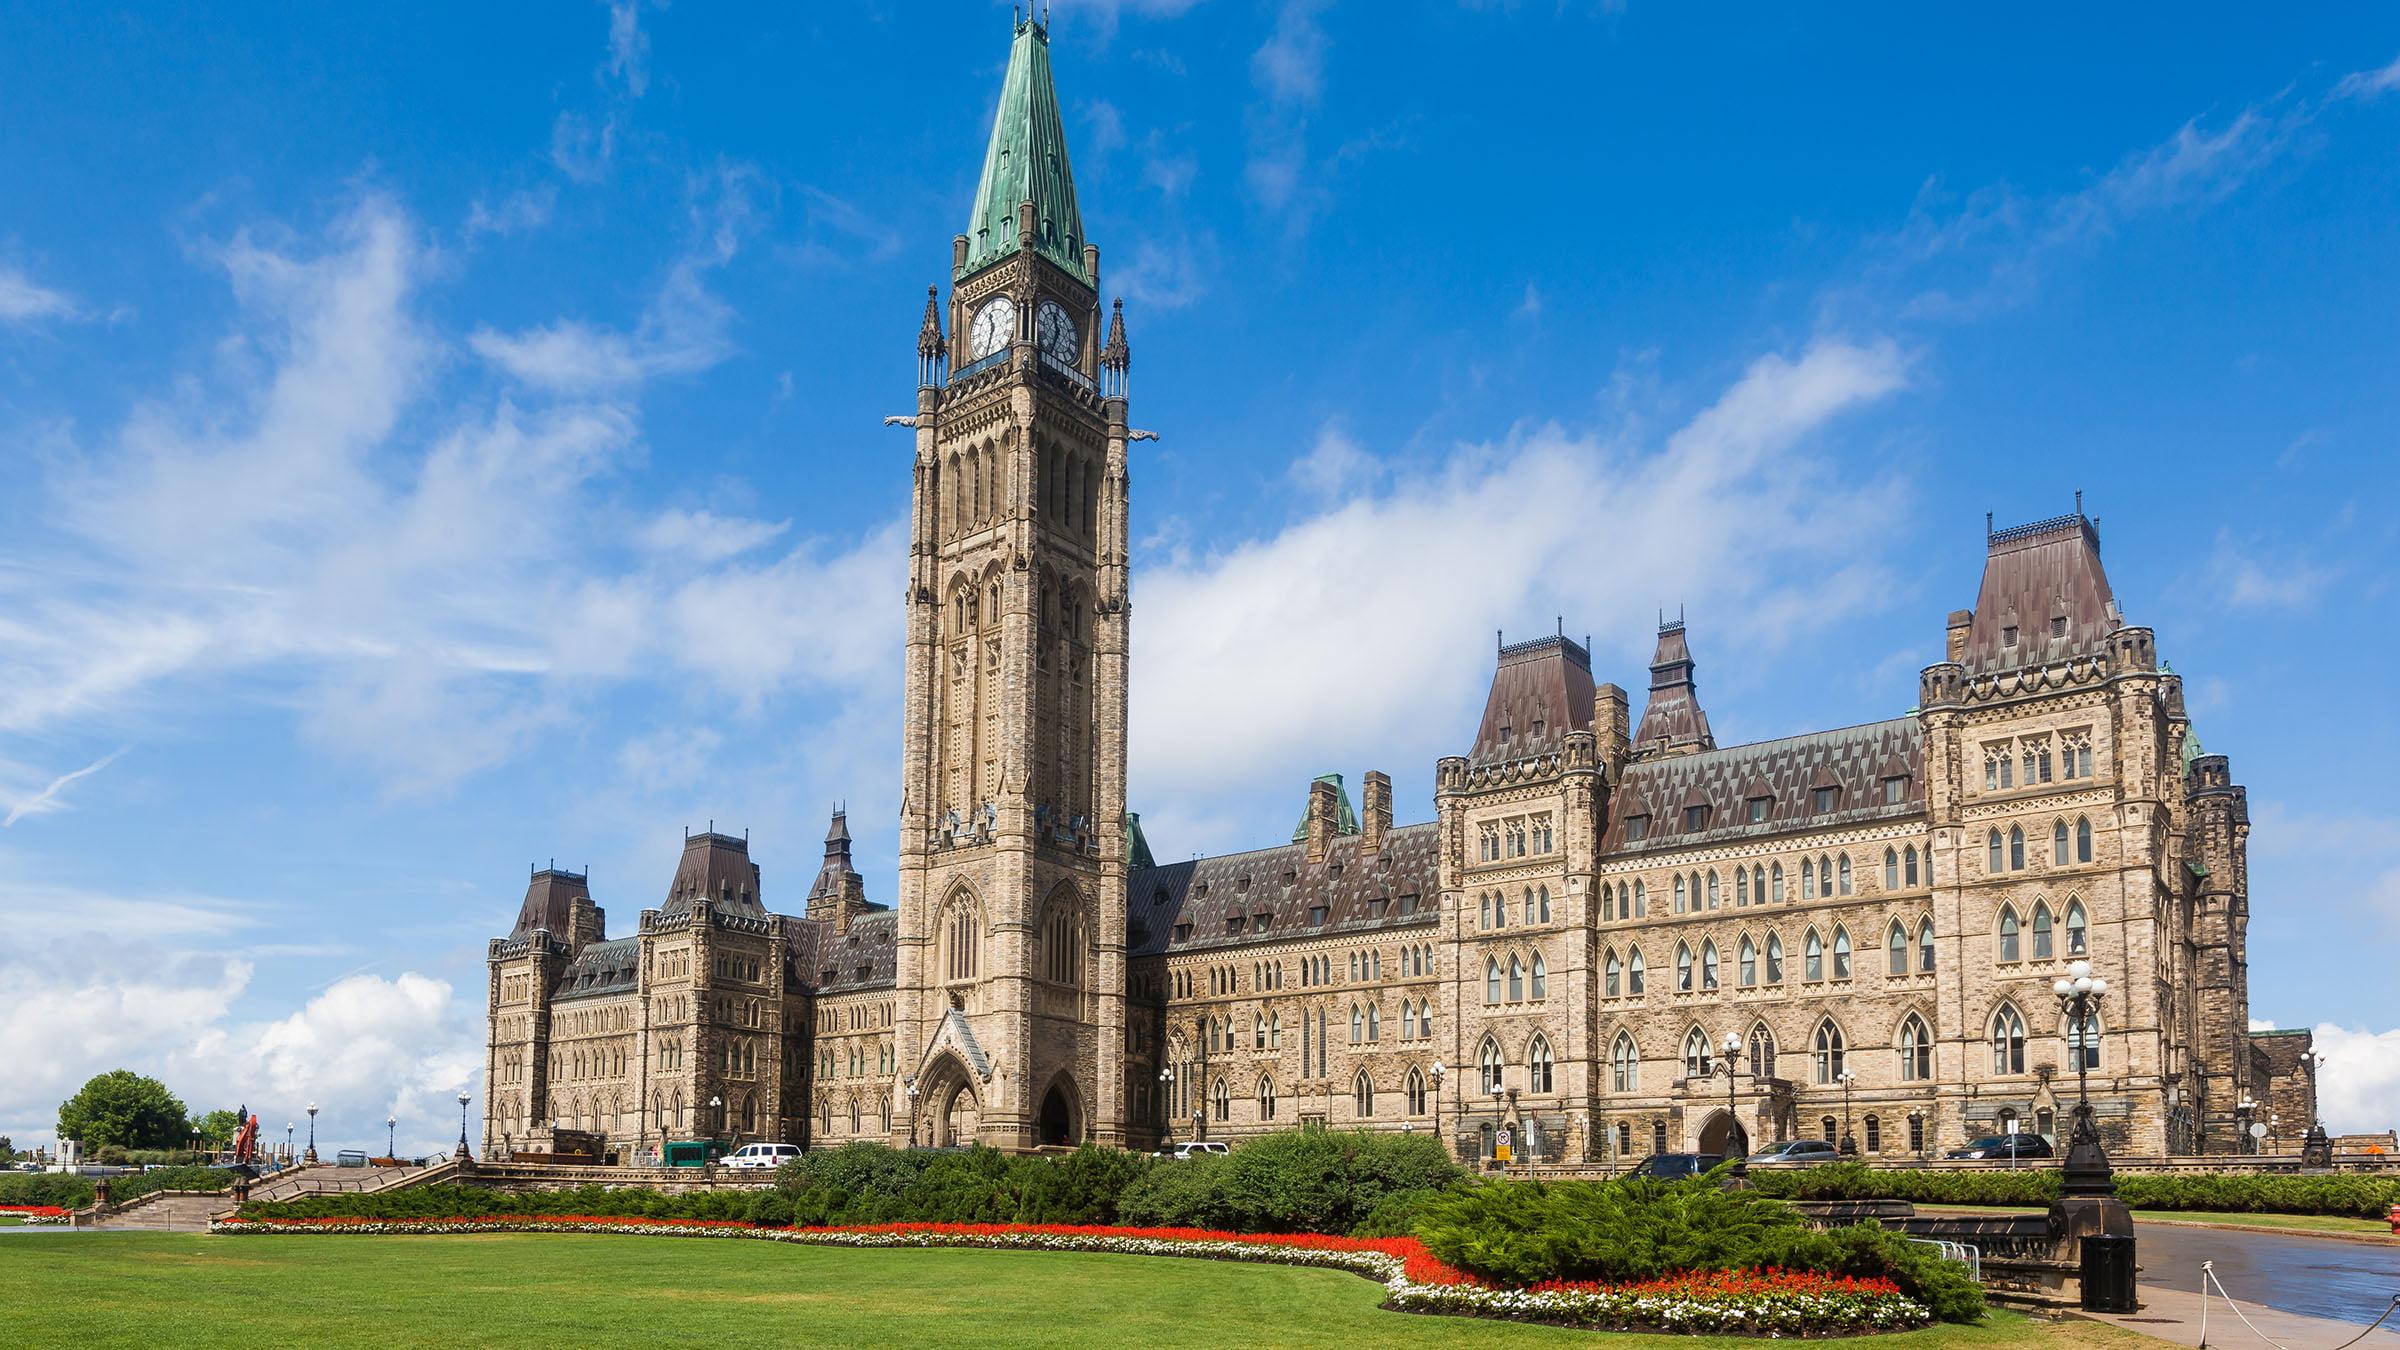 Vista del Parlamento